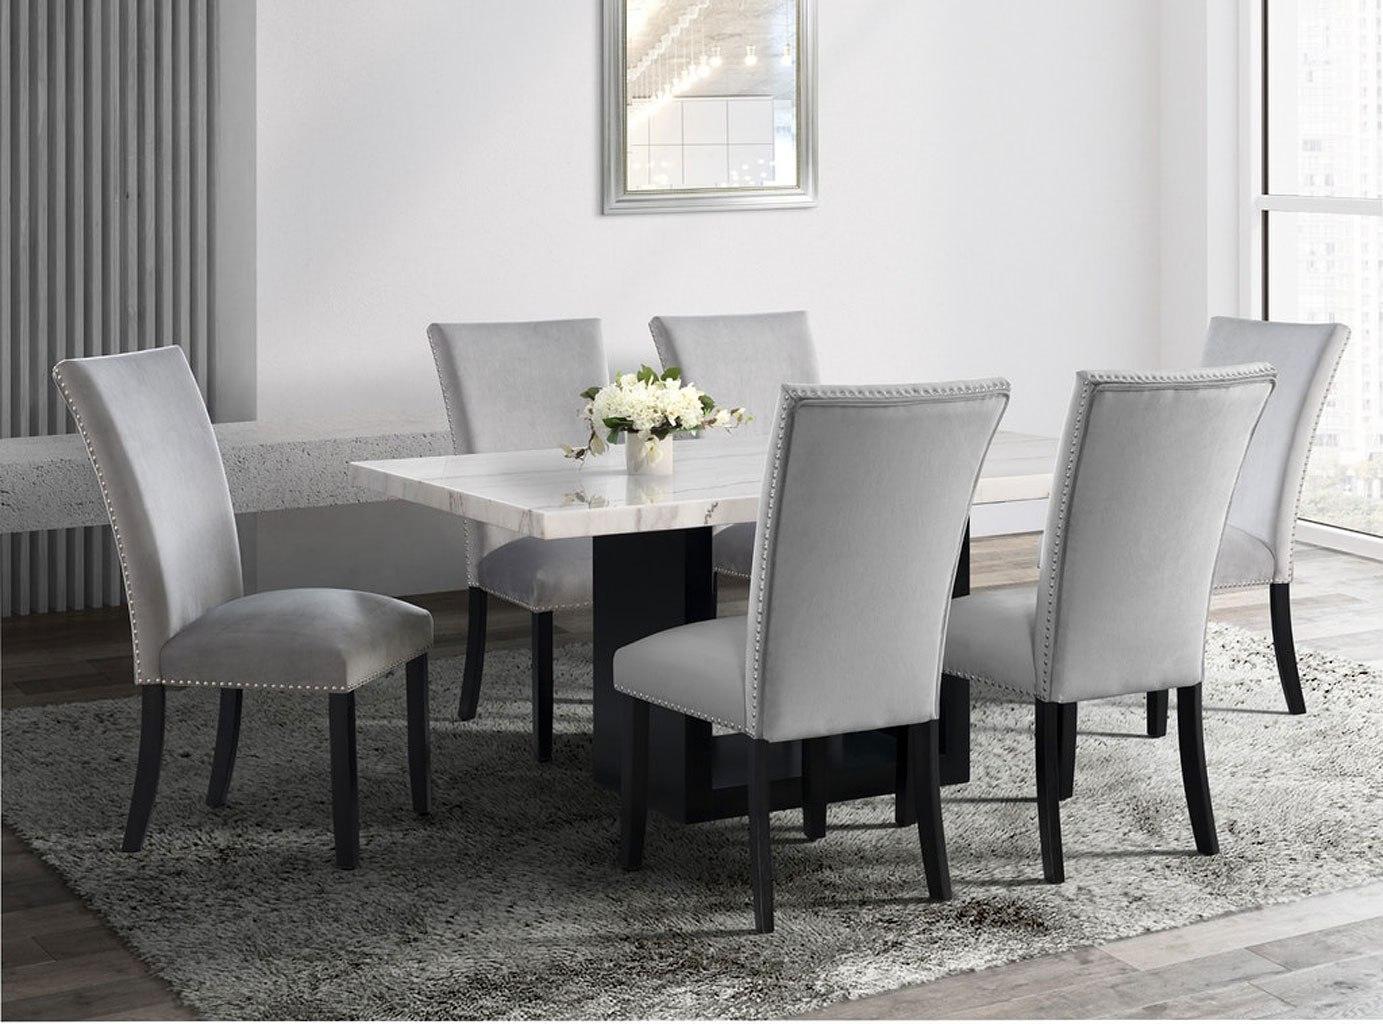 Valentino Dining Room Set w/ Grey Francesca Chairs